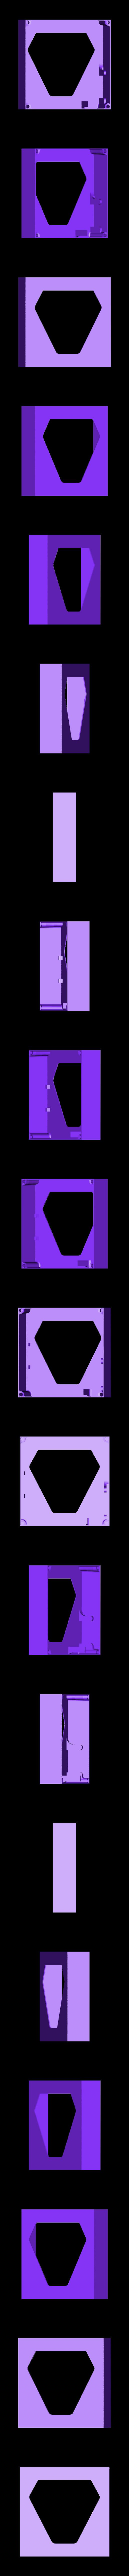 Reactor_Box_Body.STL Download free STL file Arc Reactor Display • 3D printable design, yelelabs